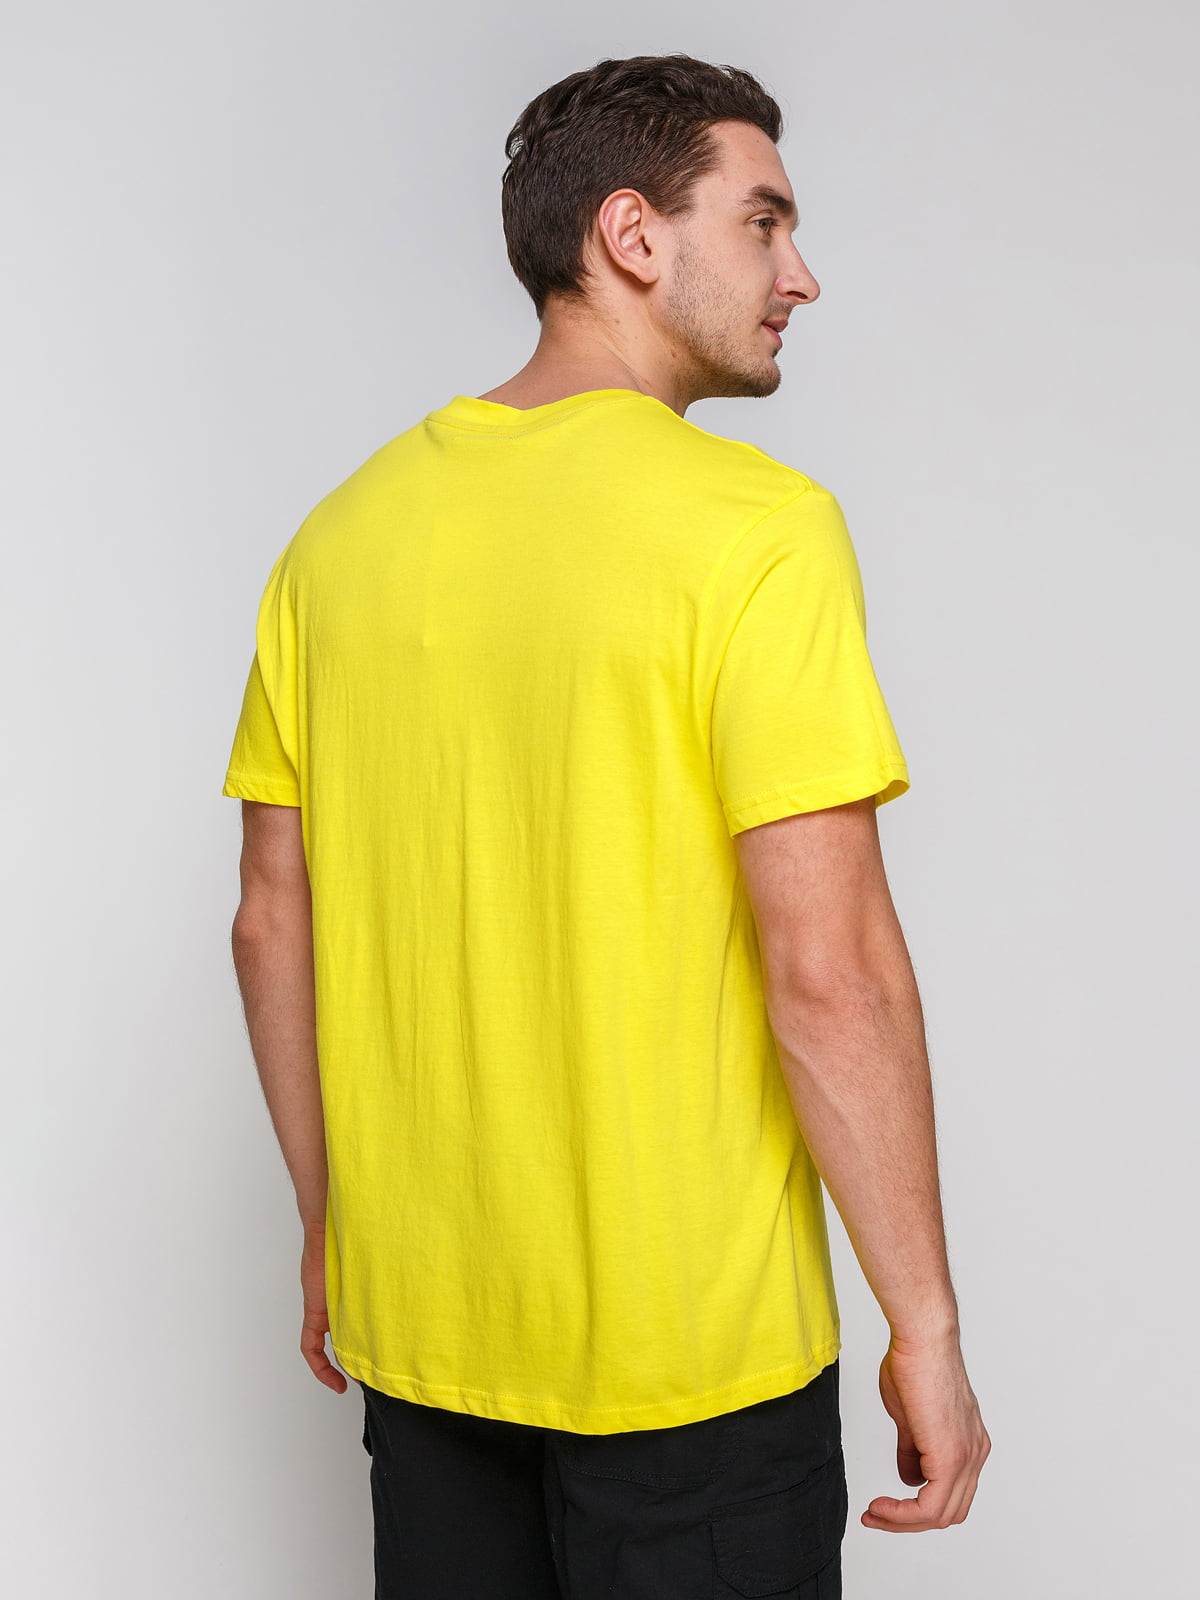 Футболка жовта | 4854998 | фото 2